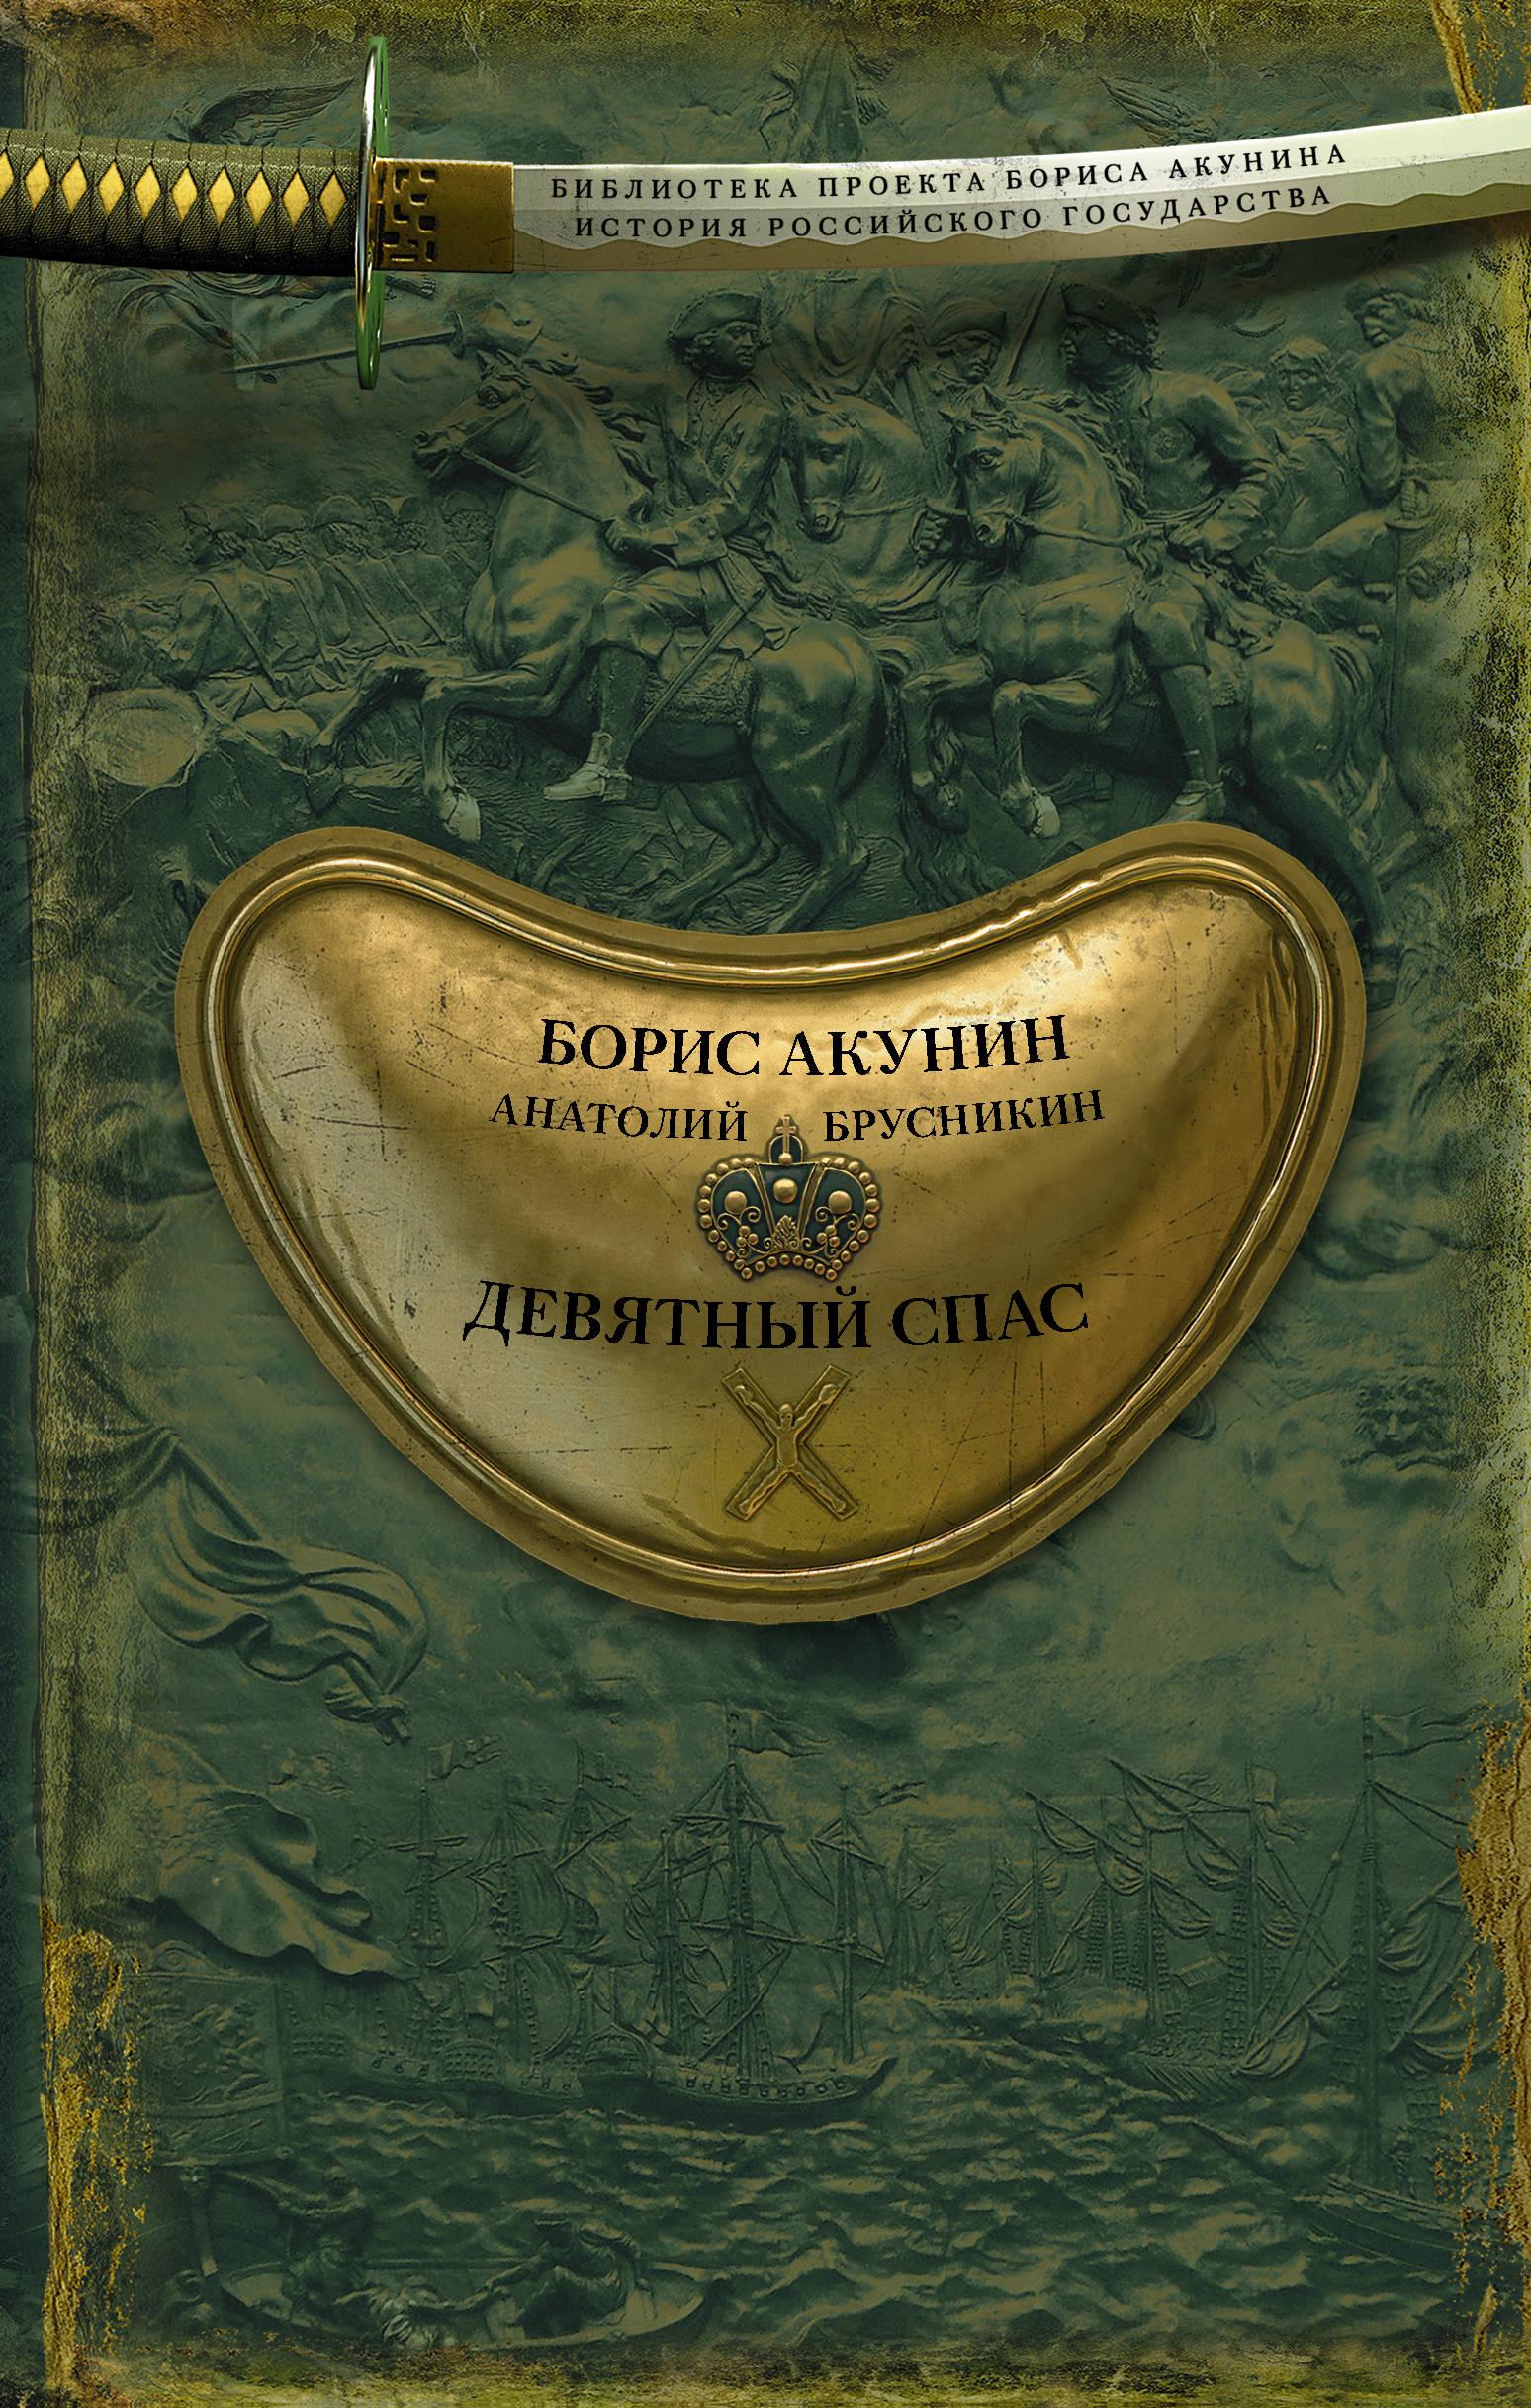 Борис Акунин, Анатолий Брусникин Девятный Спас ISBN: 978-5-17-106605-5